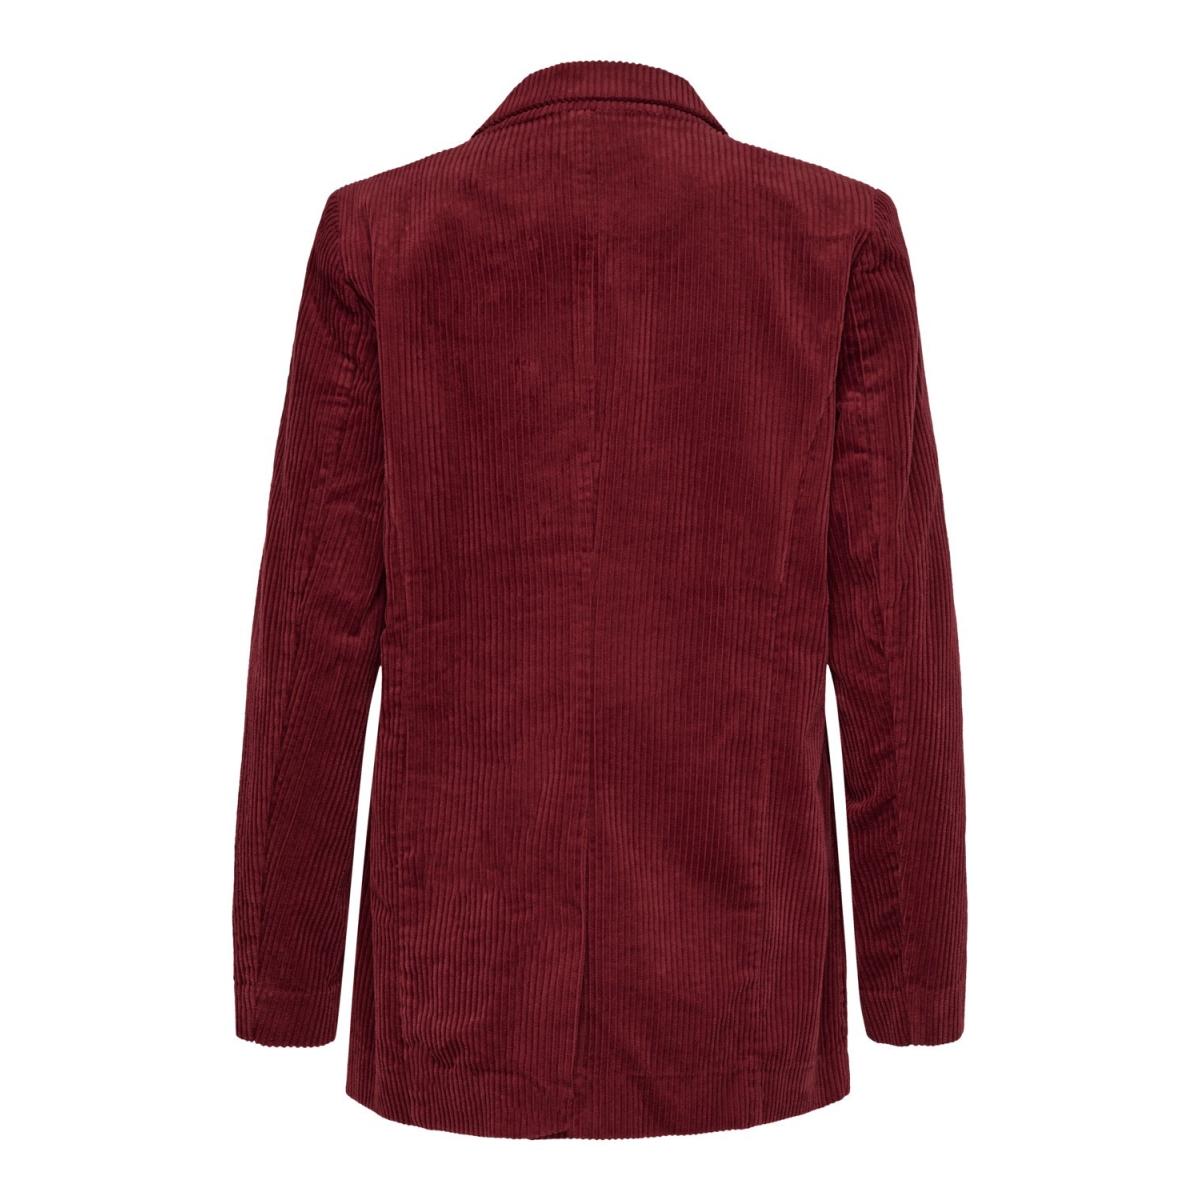 jdykira double breasted blazer pnt 15184439 jacqueline de yong blazer syrah